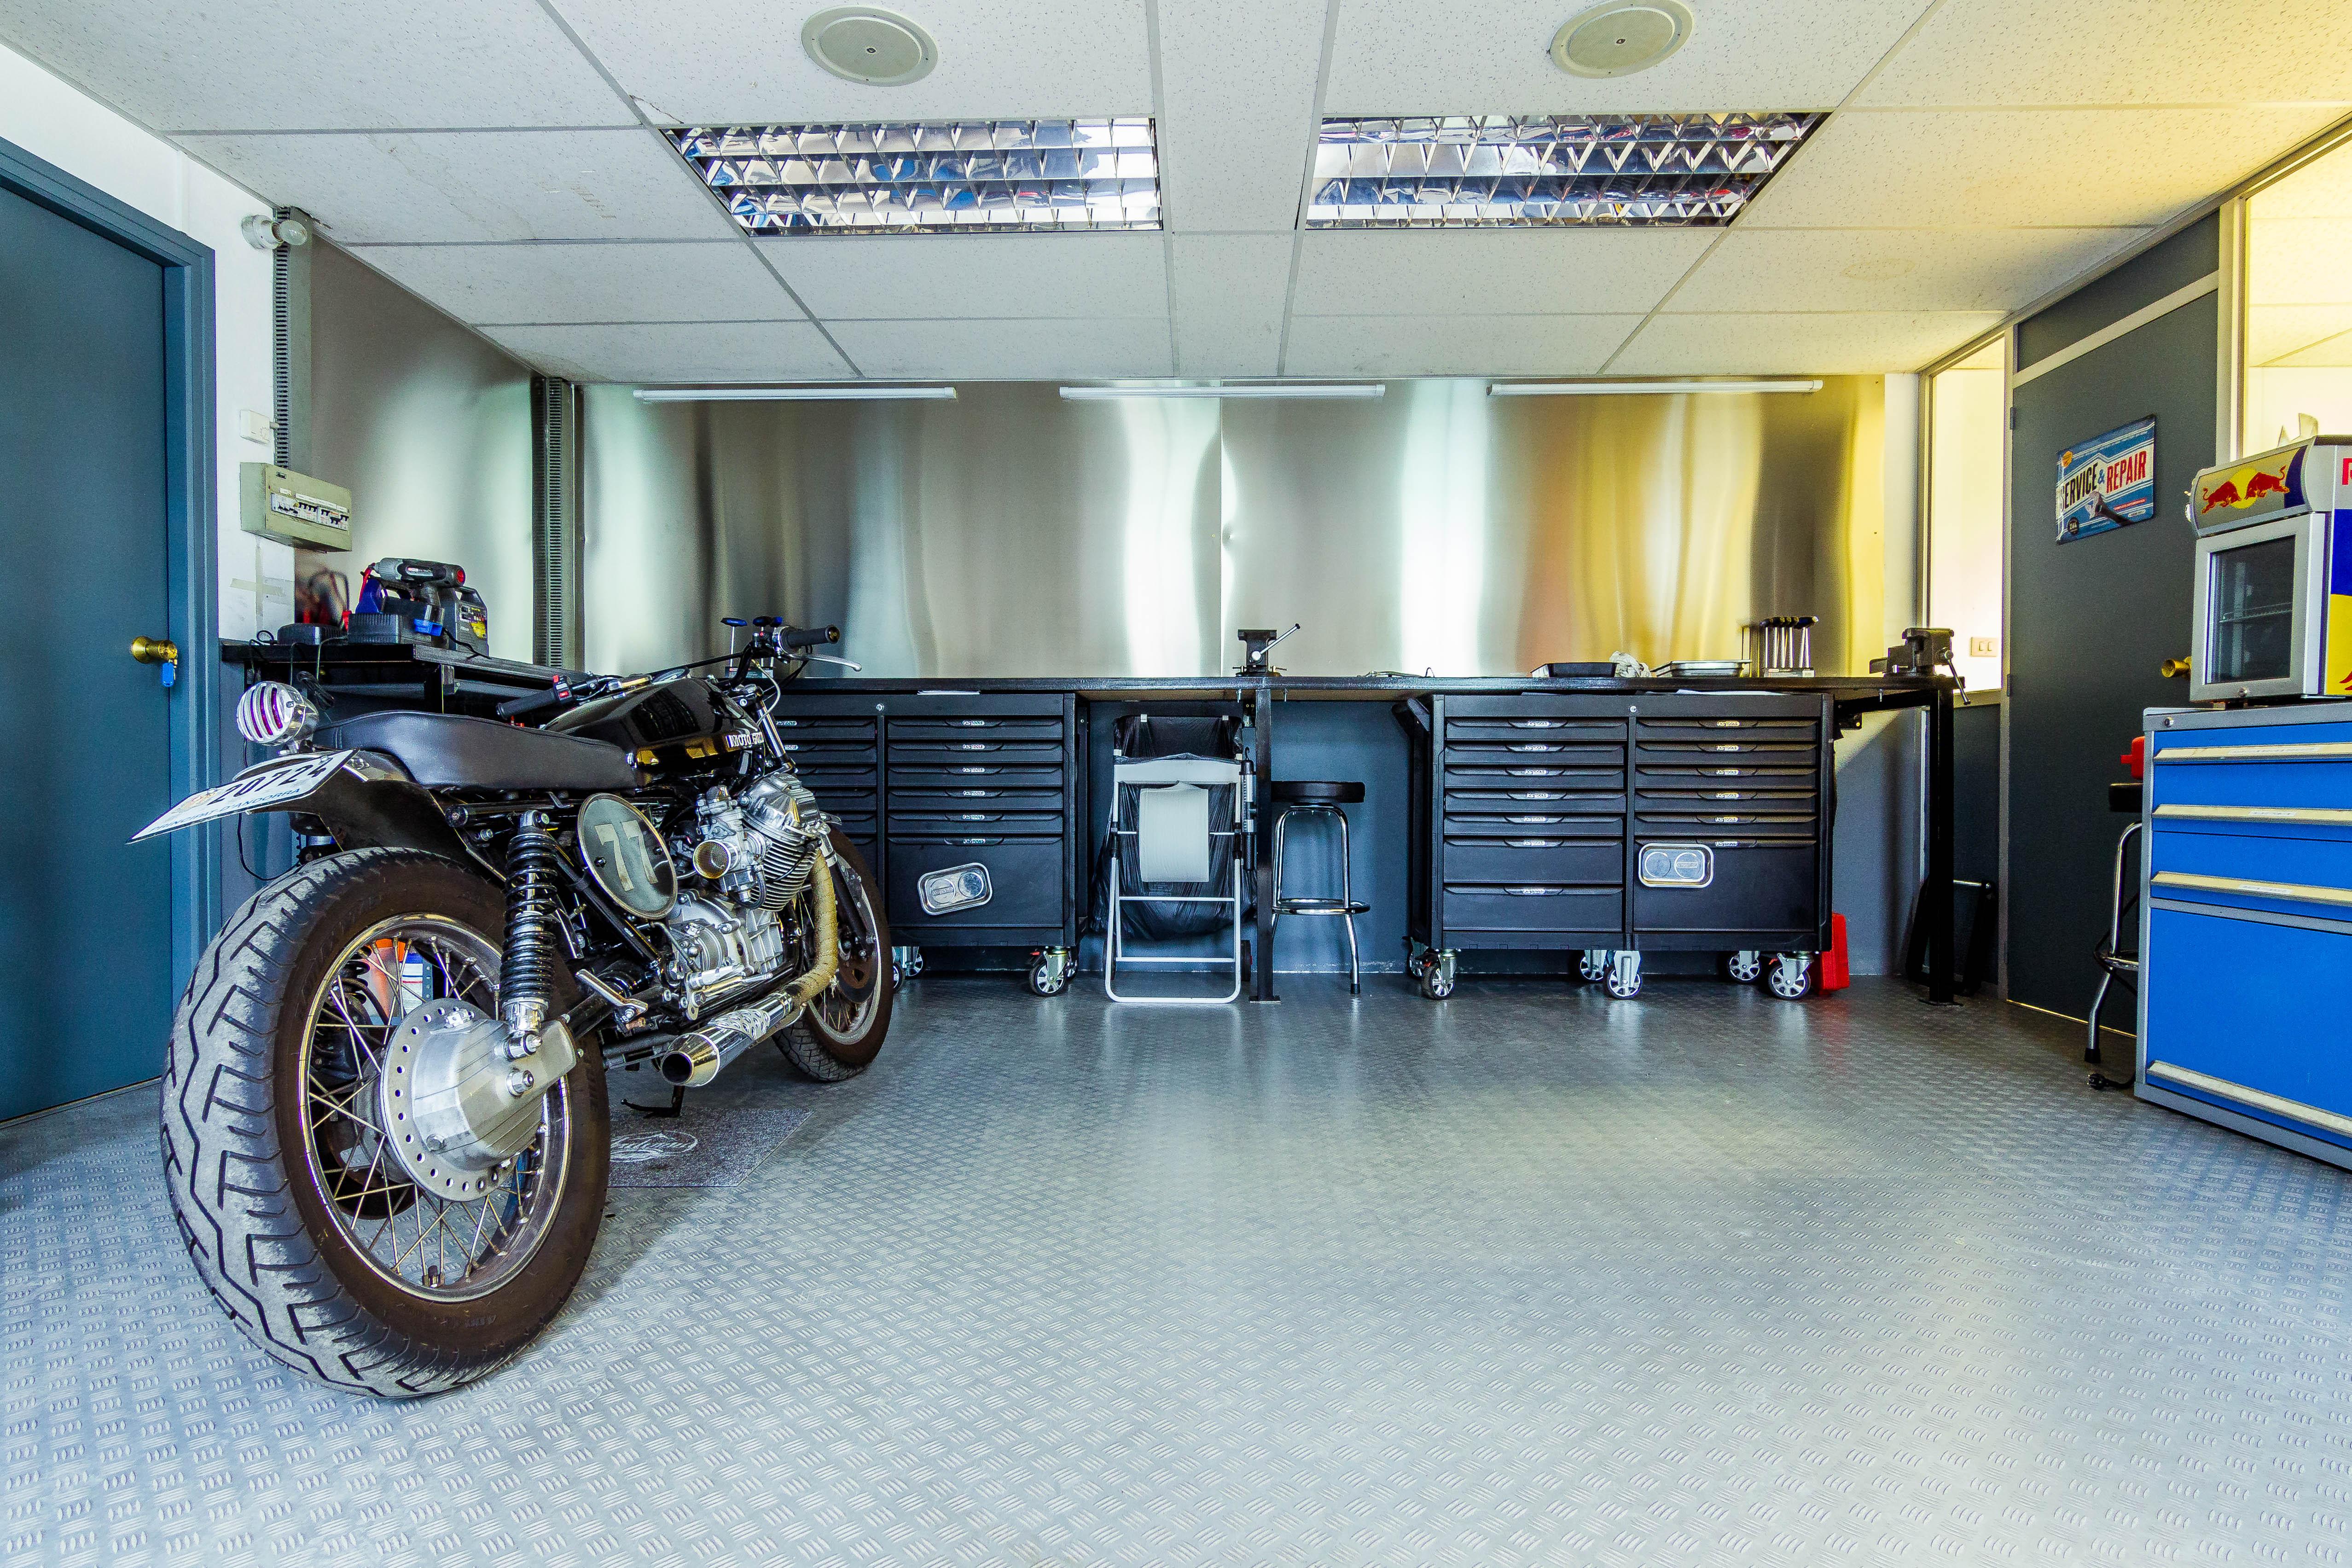 Bike in the shop, Tools, Workshop, Showroom, Motorcycle, HQ Photo